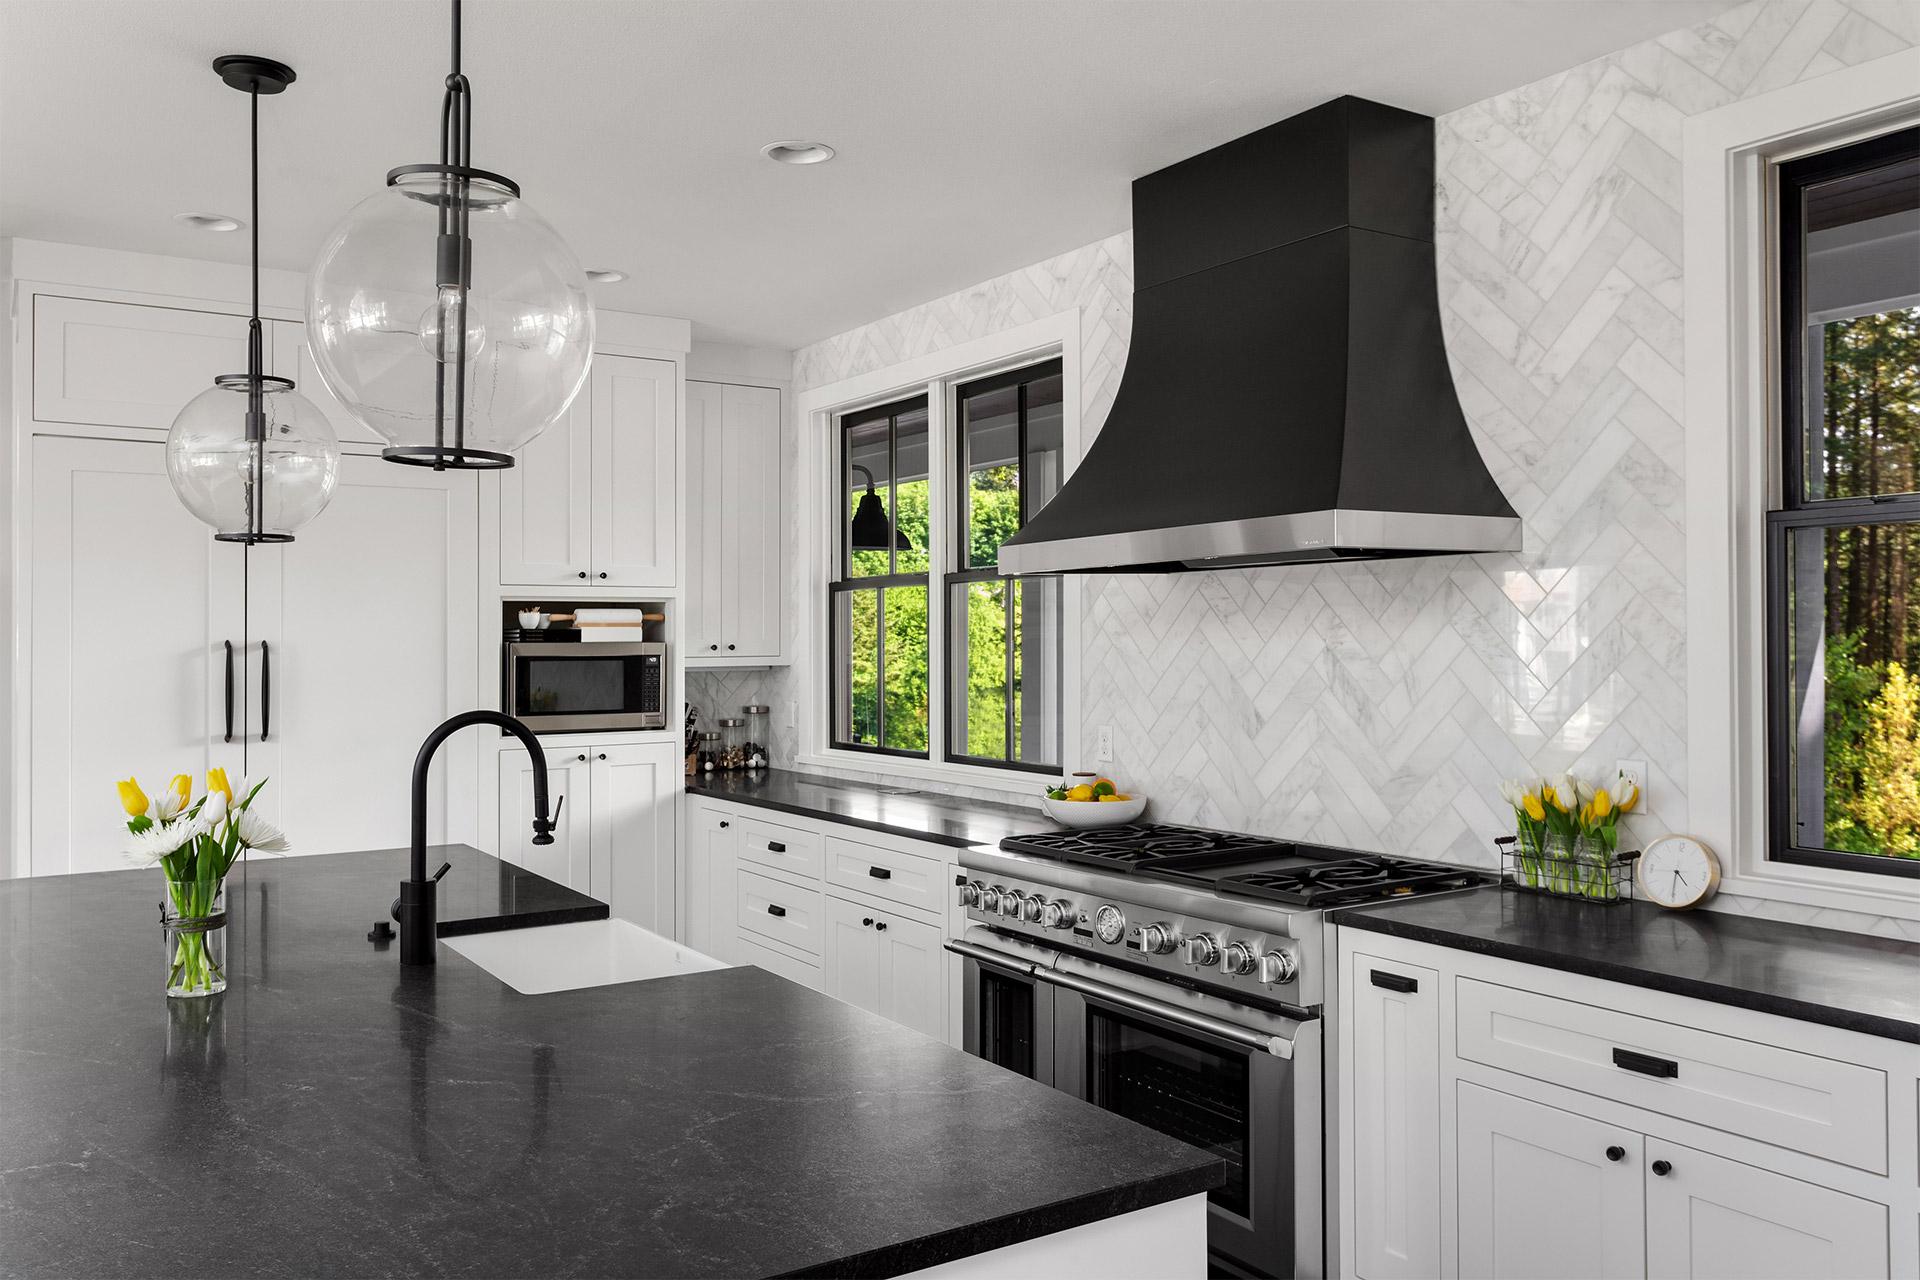 kitchen-blackSoapstone-AQ9929-MonarchCollection